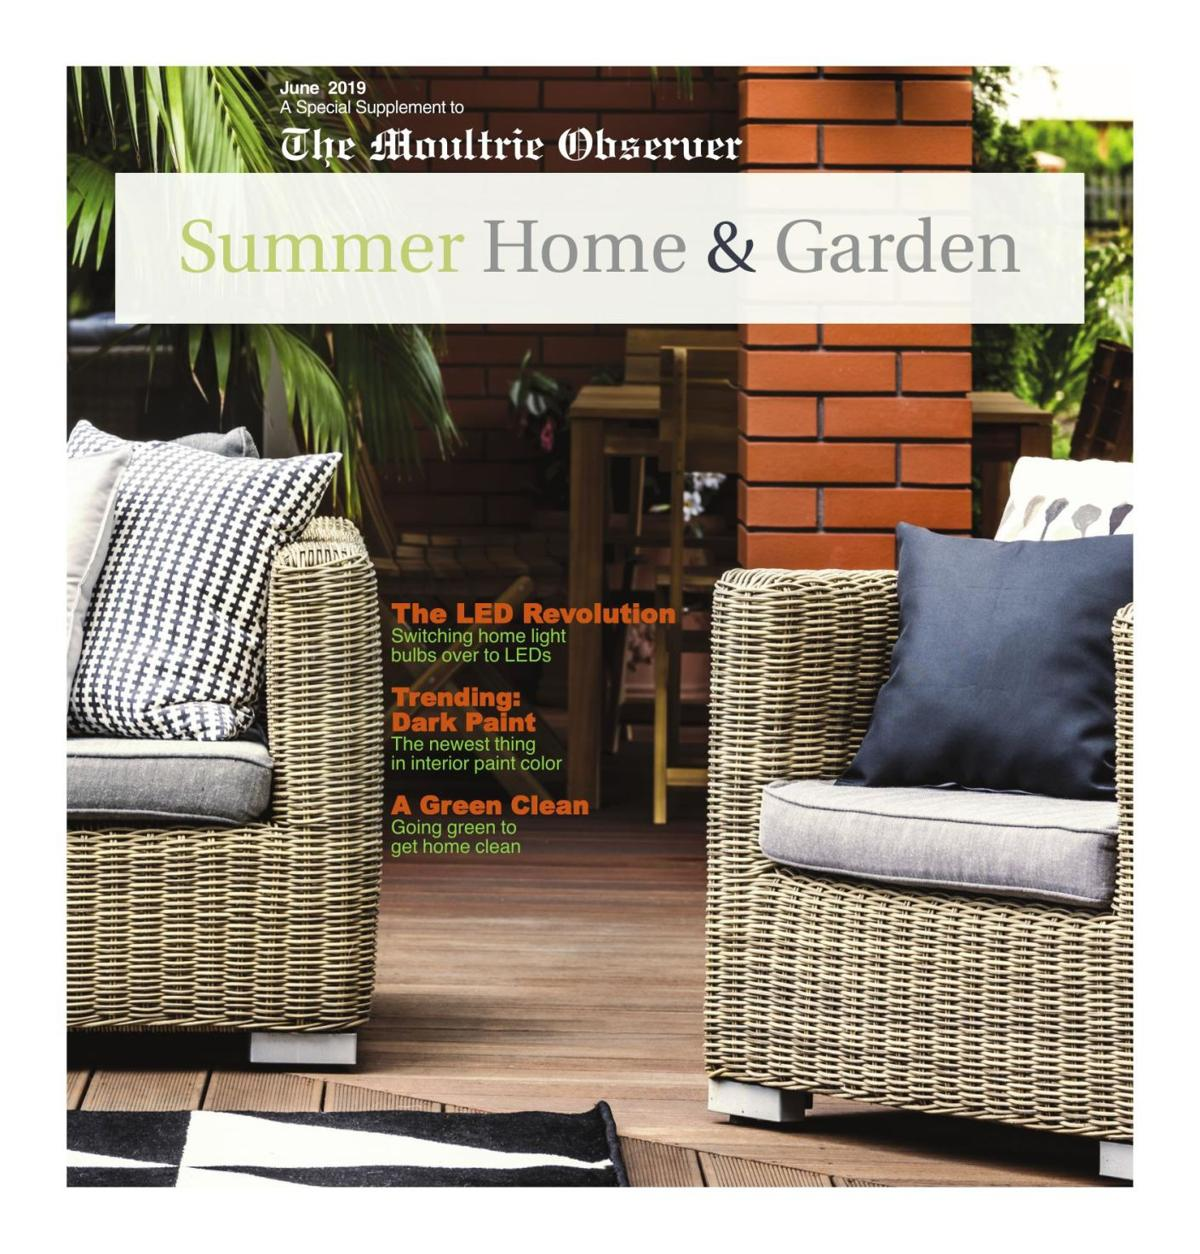 Summer Home & Garden